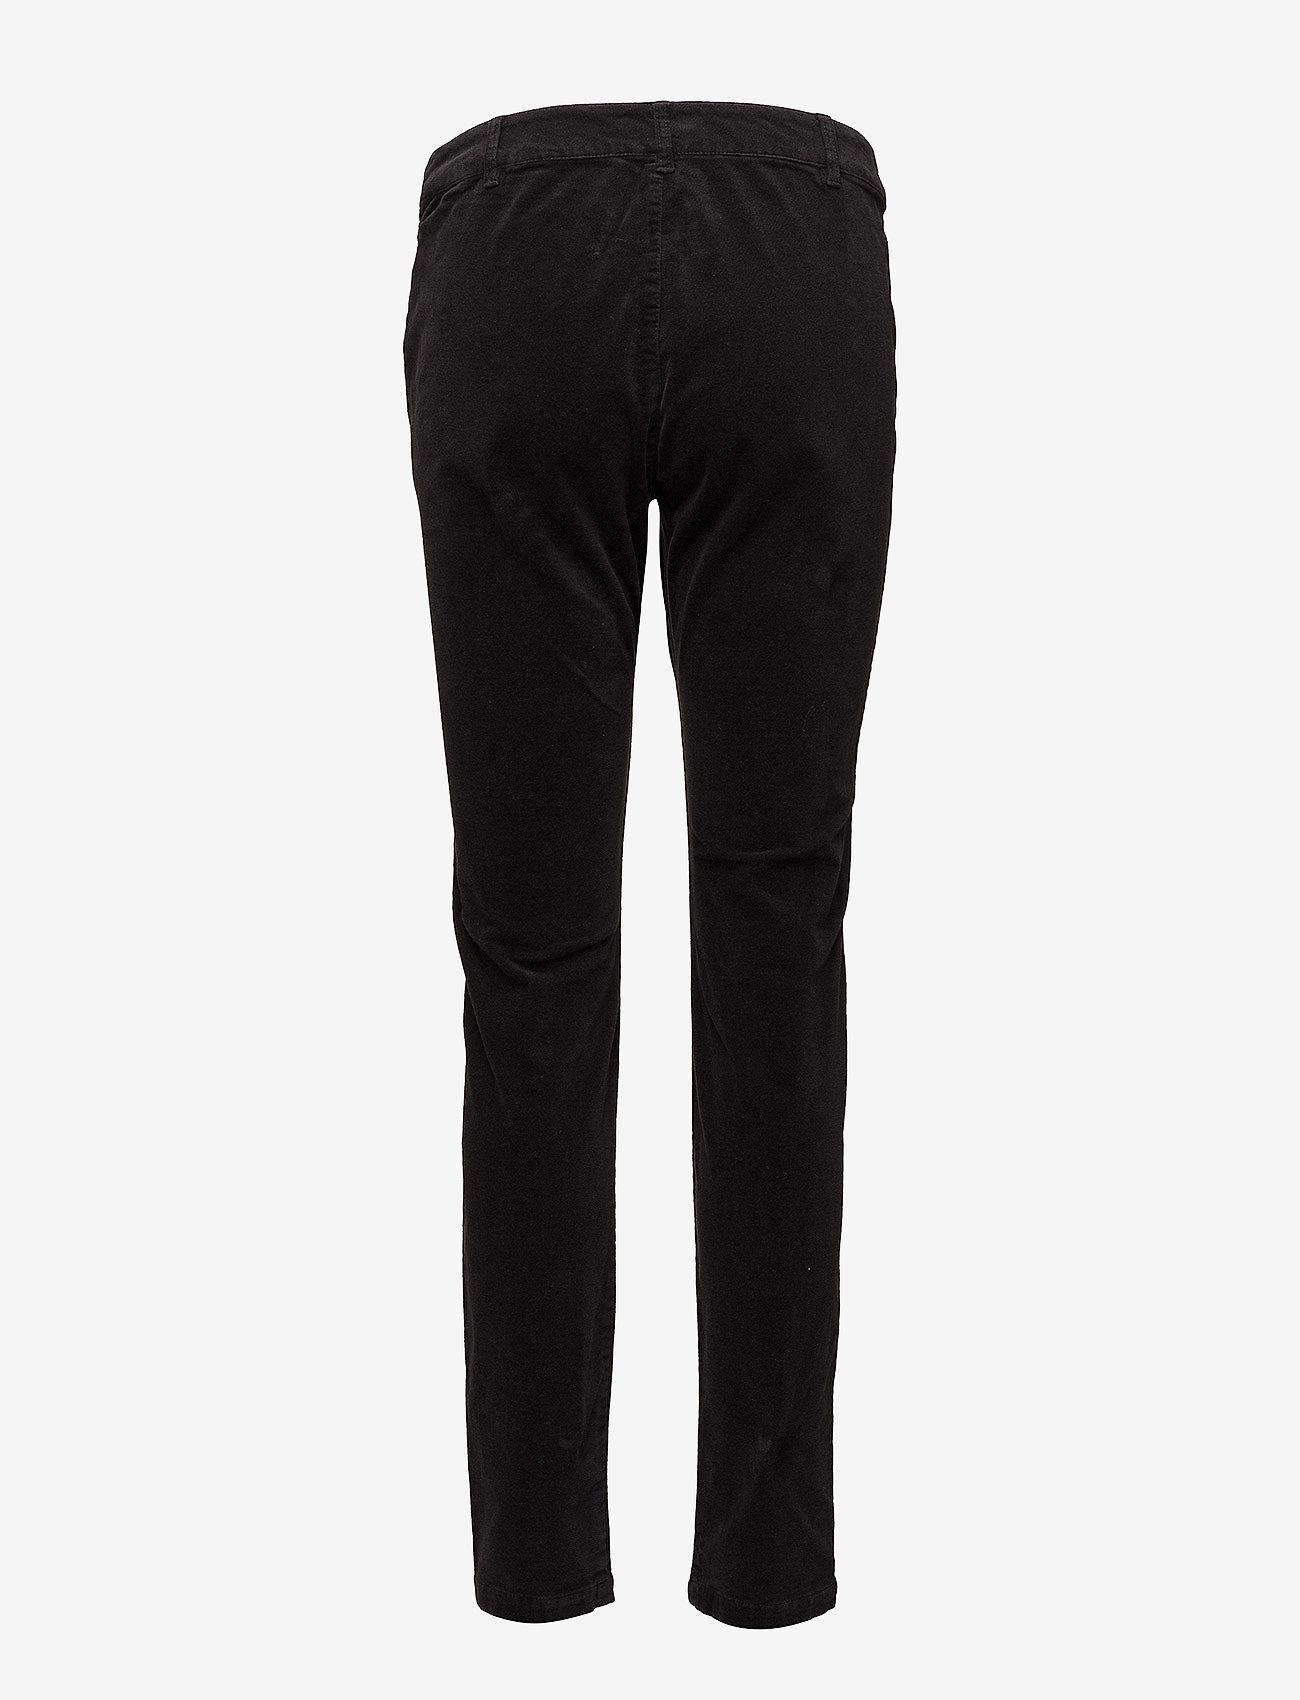 Cream - Belus velvet - kathy fit - slim fit trousers - pitch black